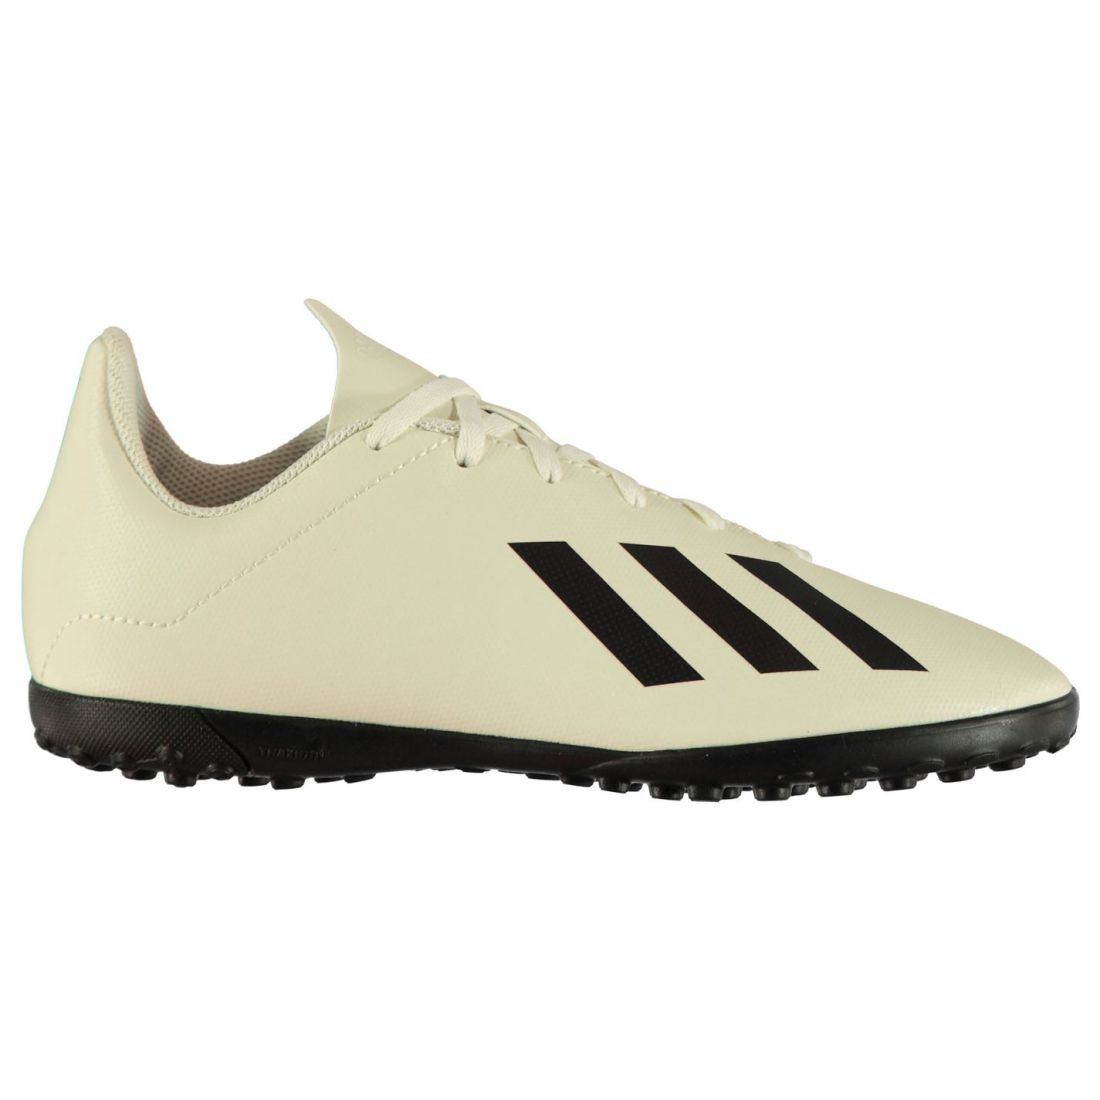 d0cd0a7534 adidas Kids Boys X Tango 18.4 Junior Astro Turf Trainers Football ...